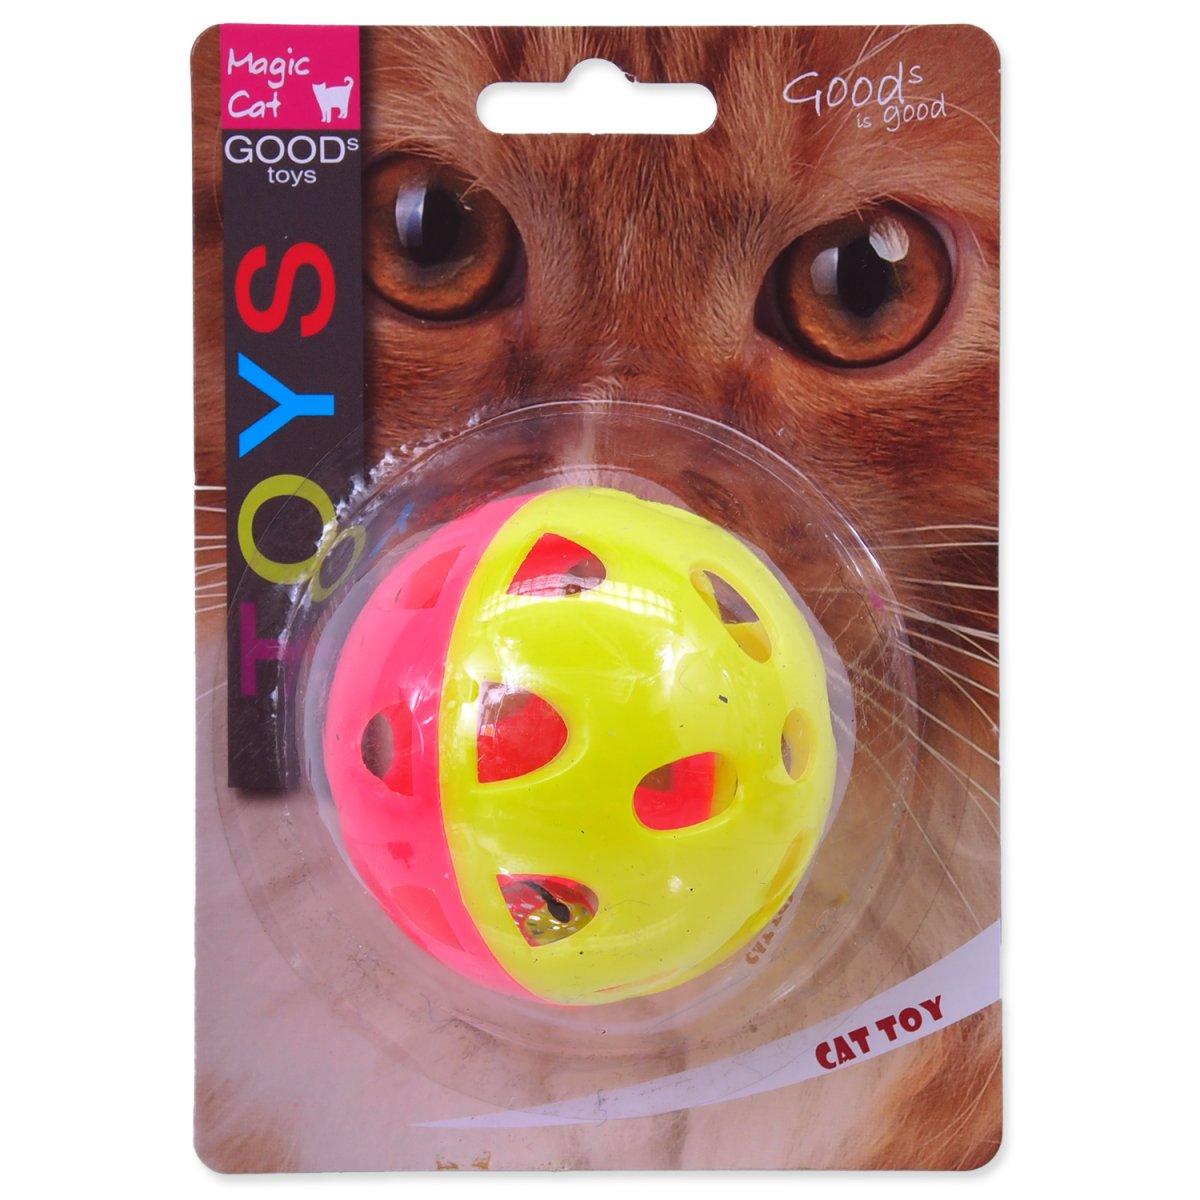 Hračka MAGIC CAT míček neonový jumbo s rolničkou 6 cm (1ks)